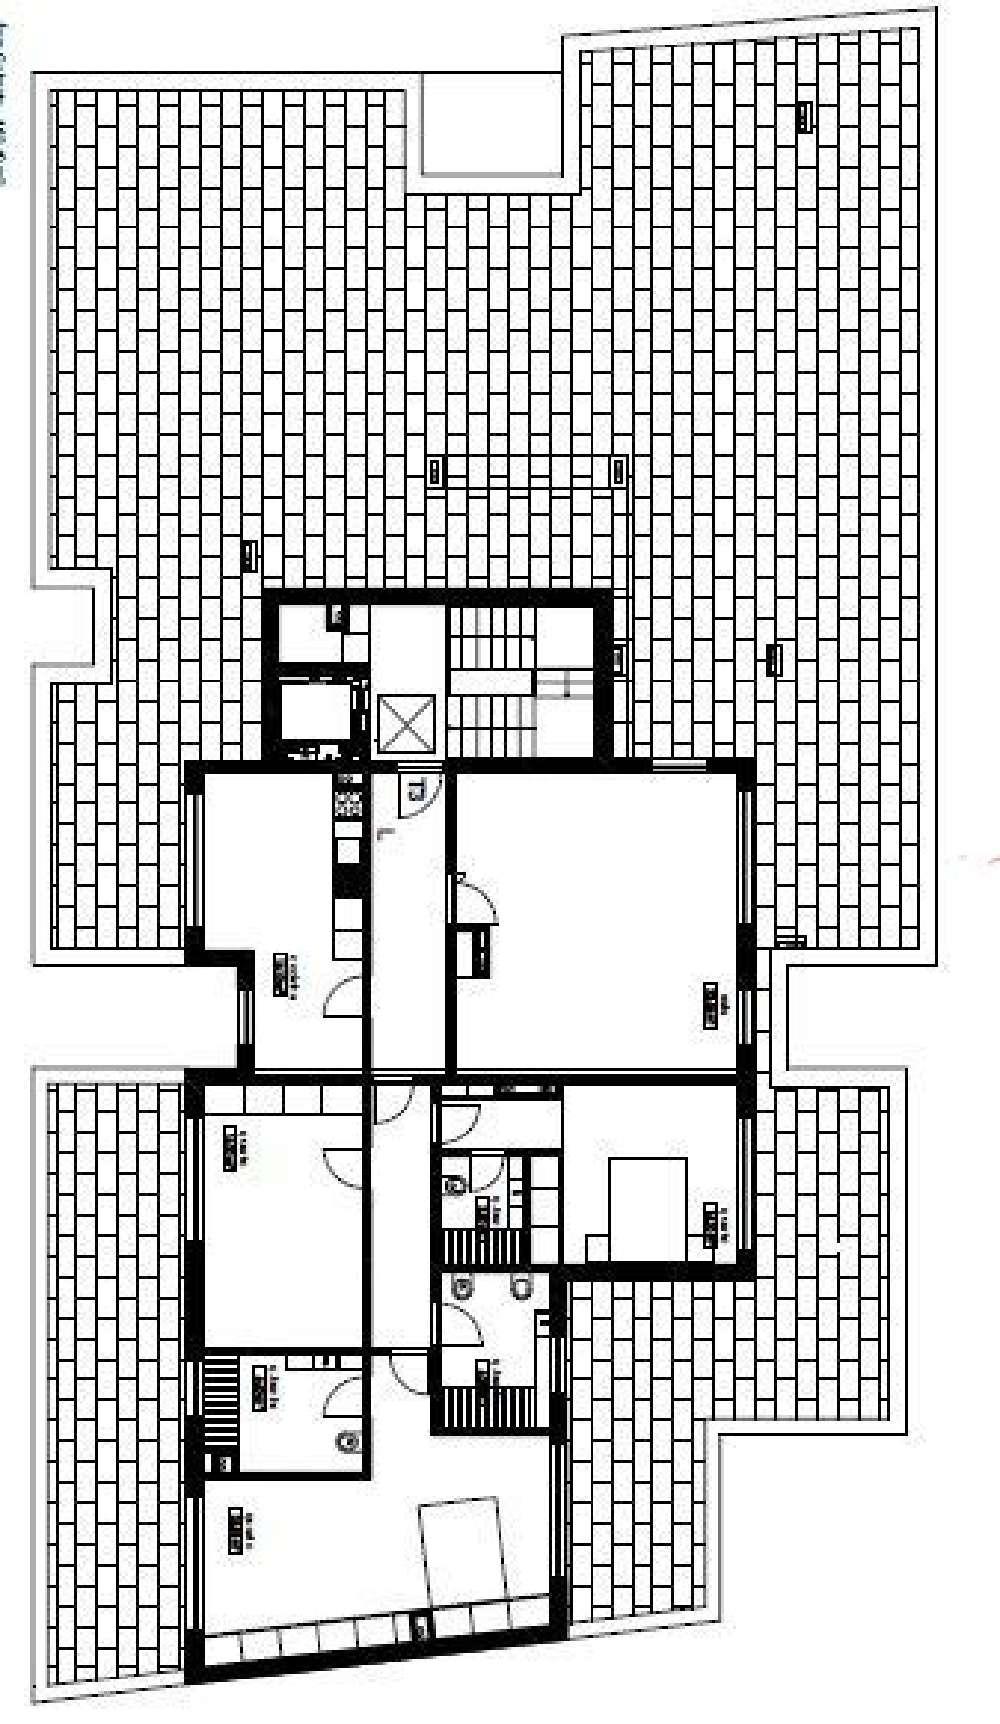 Lavra Matosinhos Apartment Bild 124050